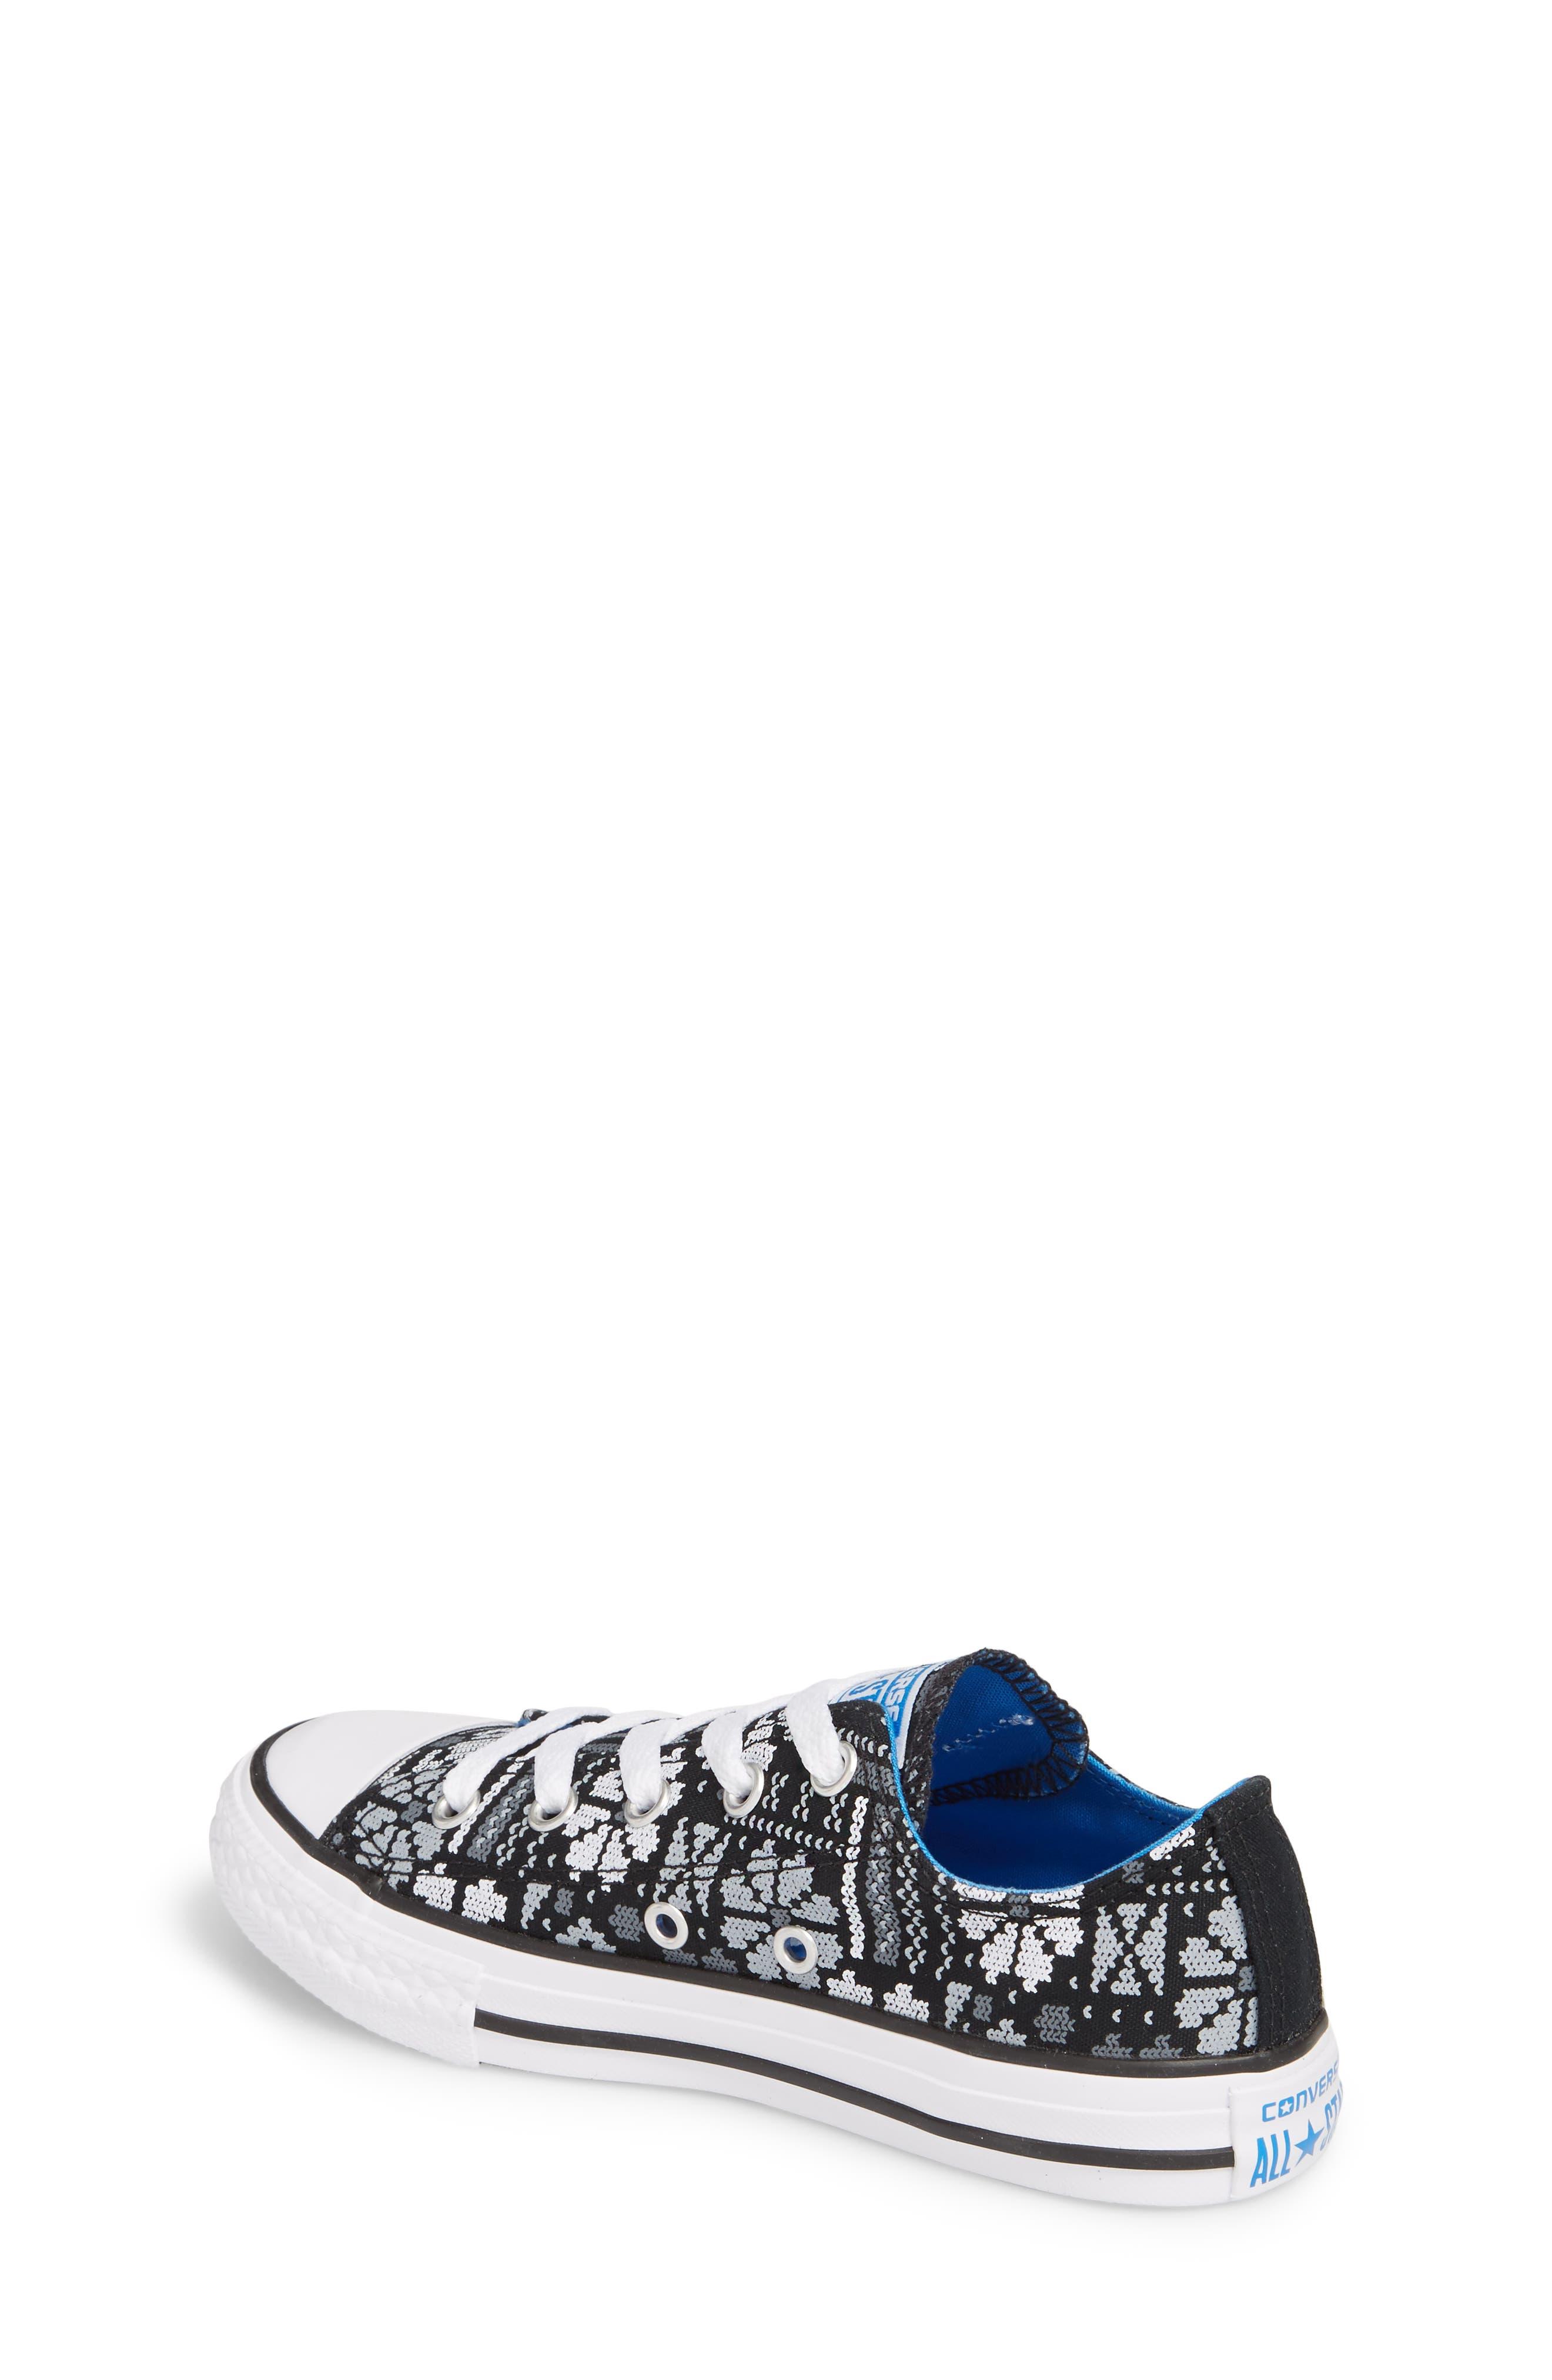 Alternate Image 2  - Converse Chuck Taylor® All Star® Winter Ox Sneaker (Toddler, Little Kid & Big Kid)